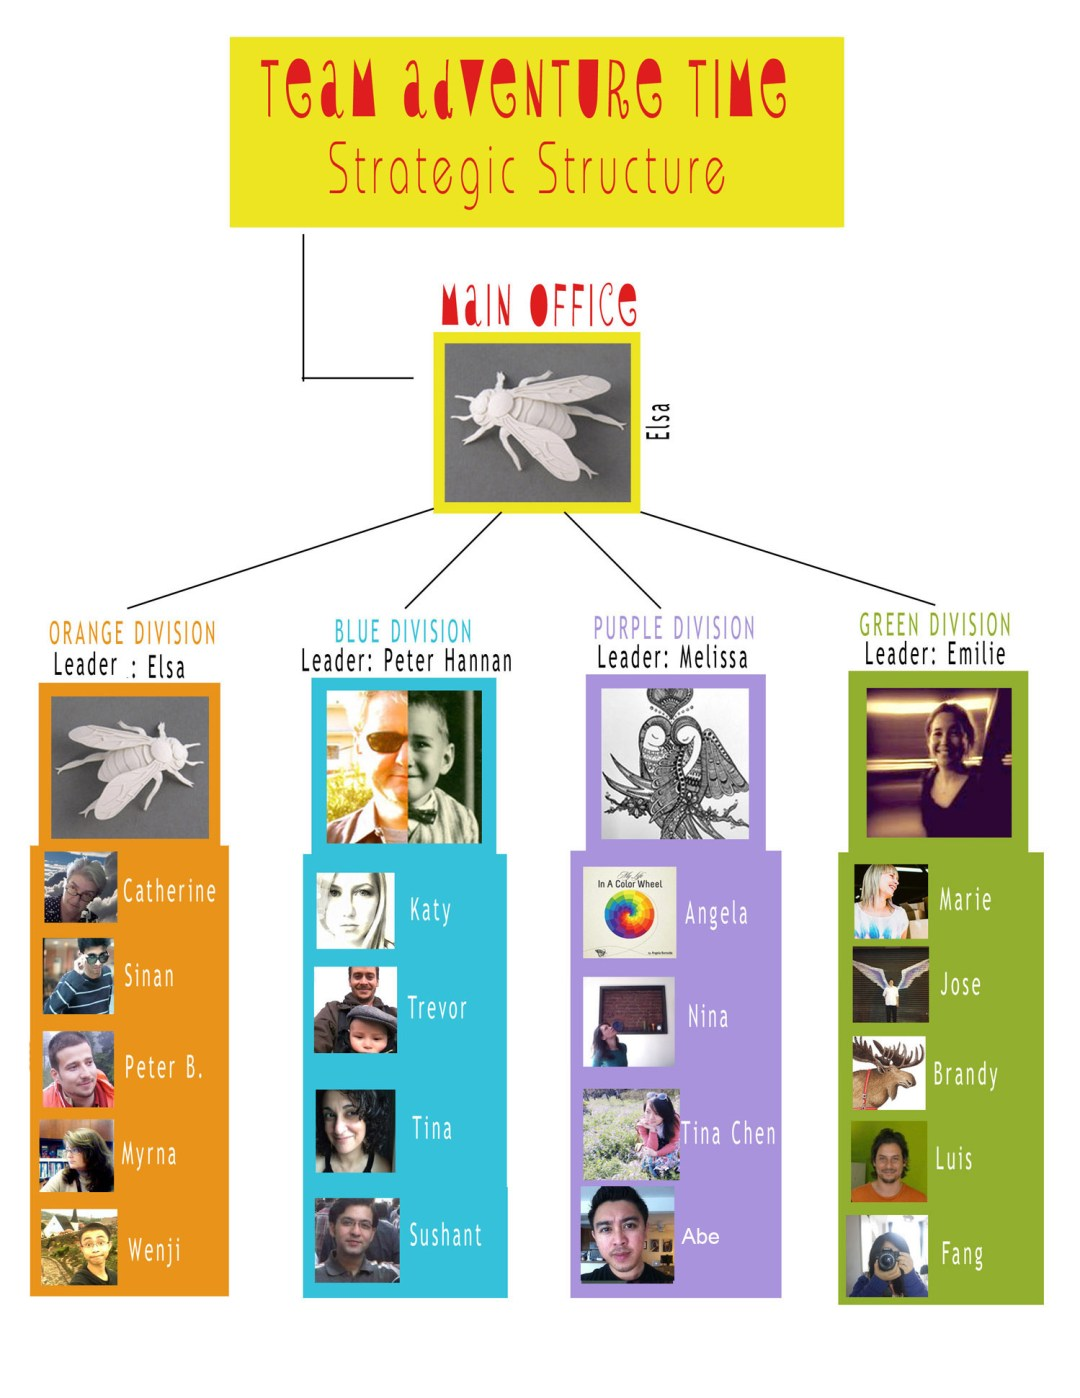 team strategic structure